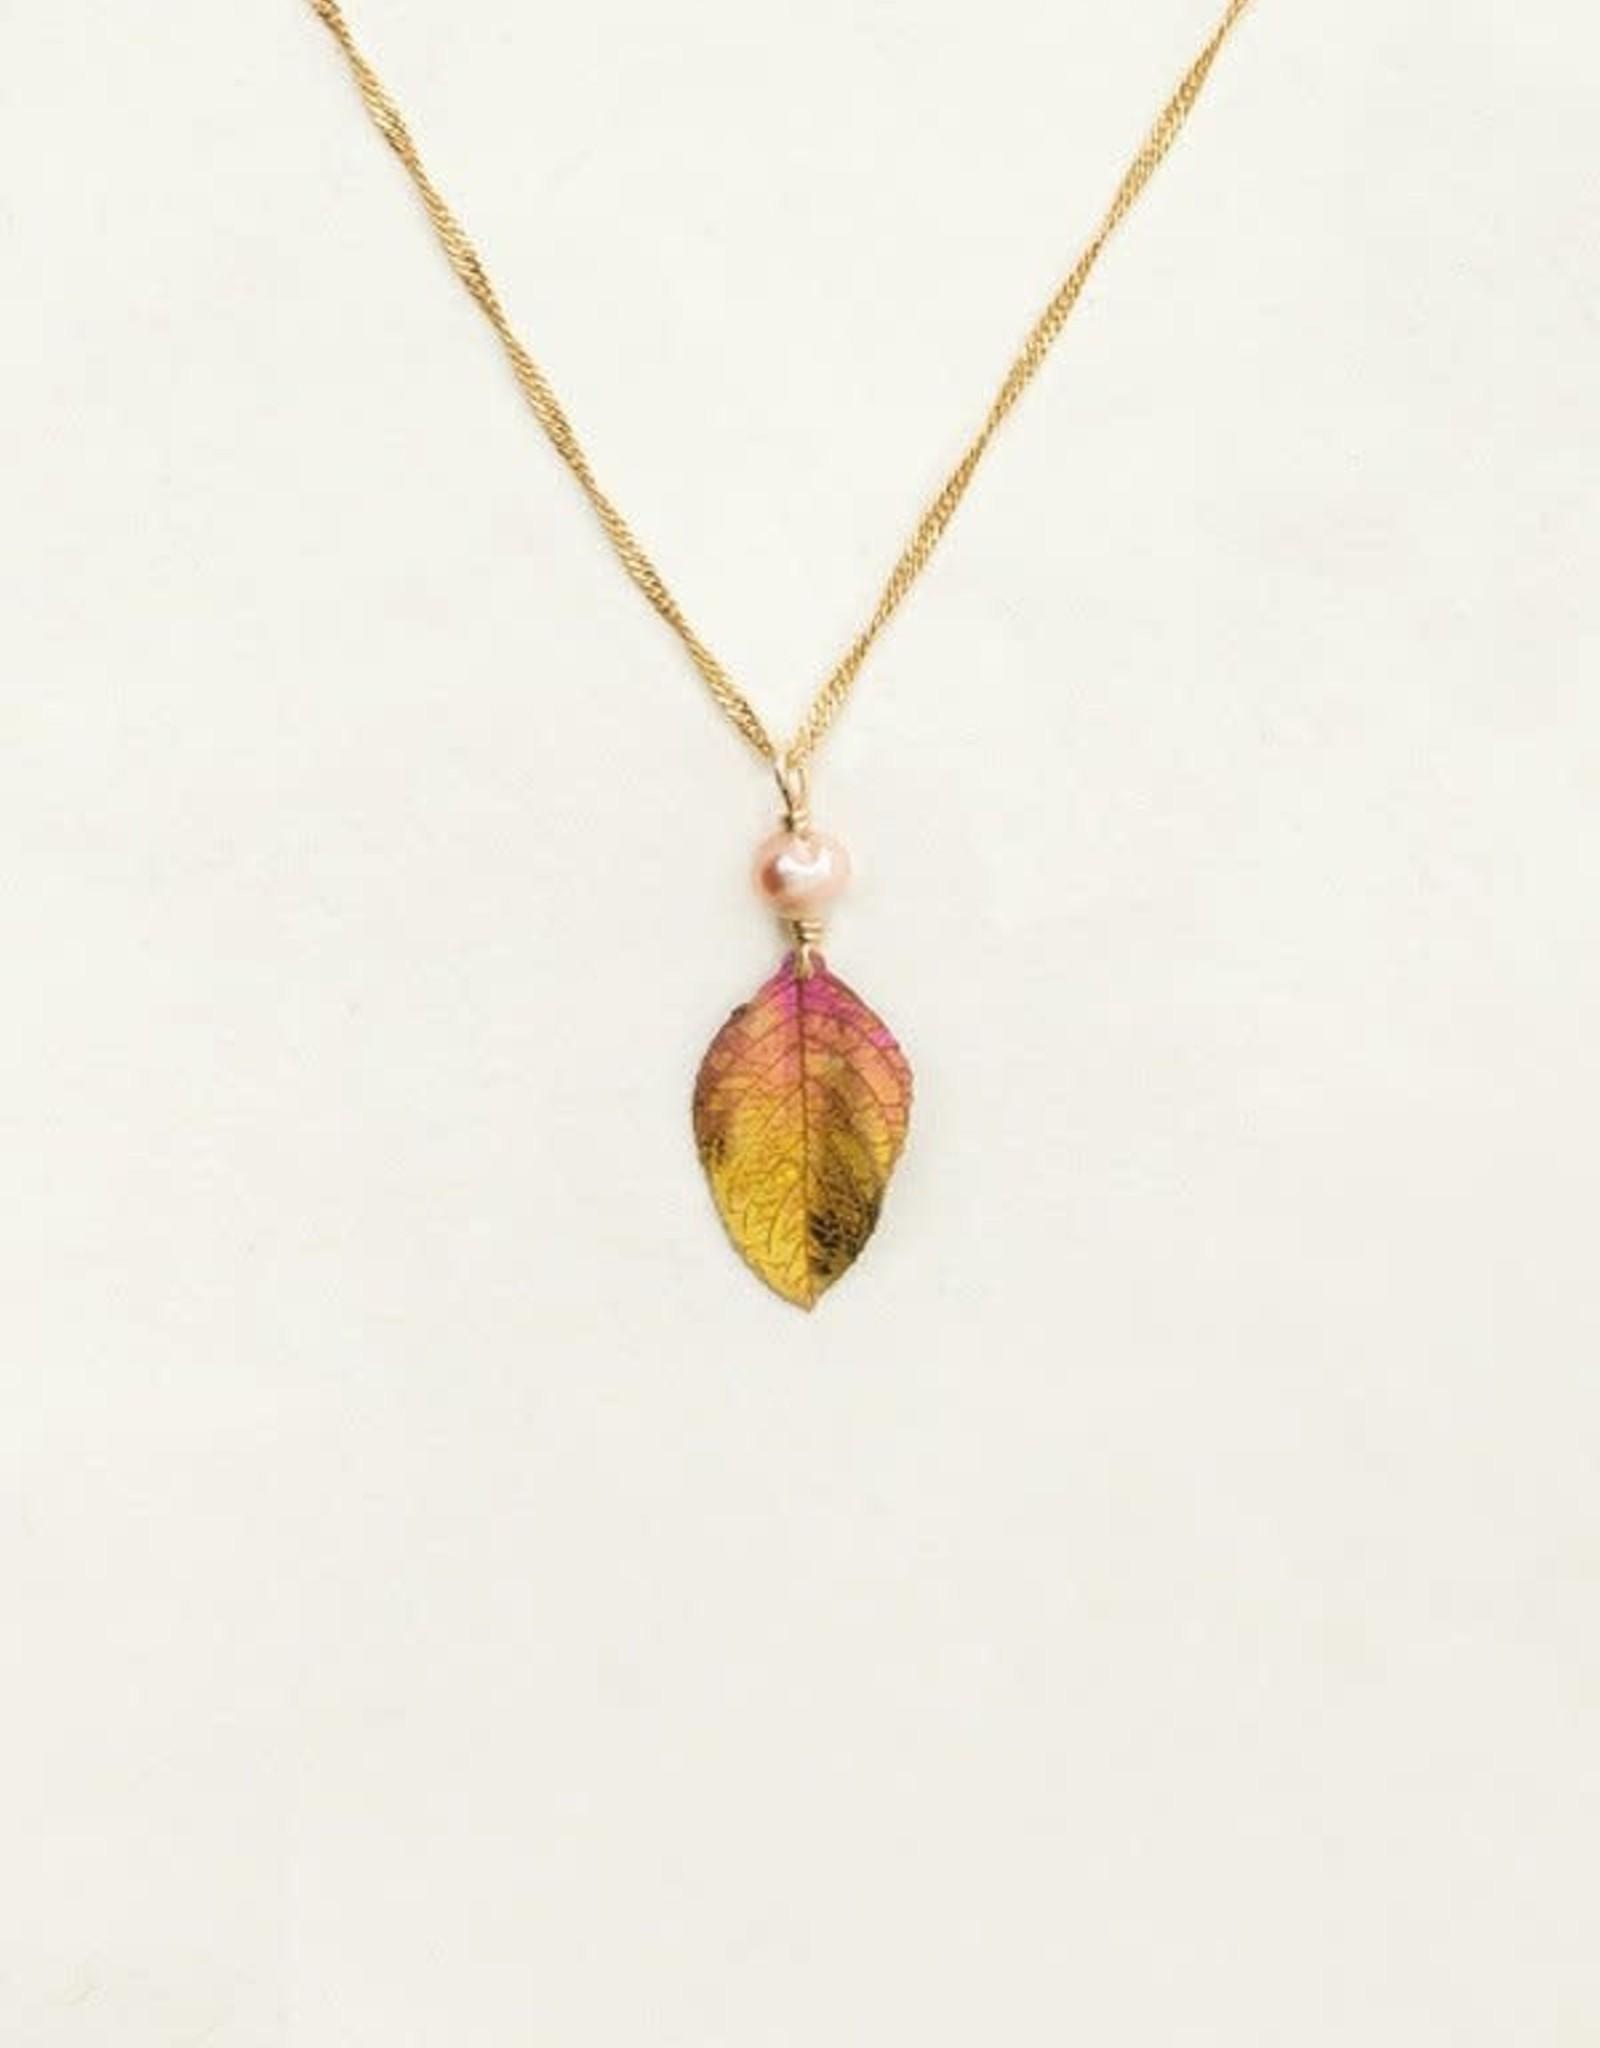 Holly Yashi Peach Healing Leaf Pendant Necklace